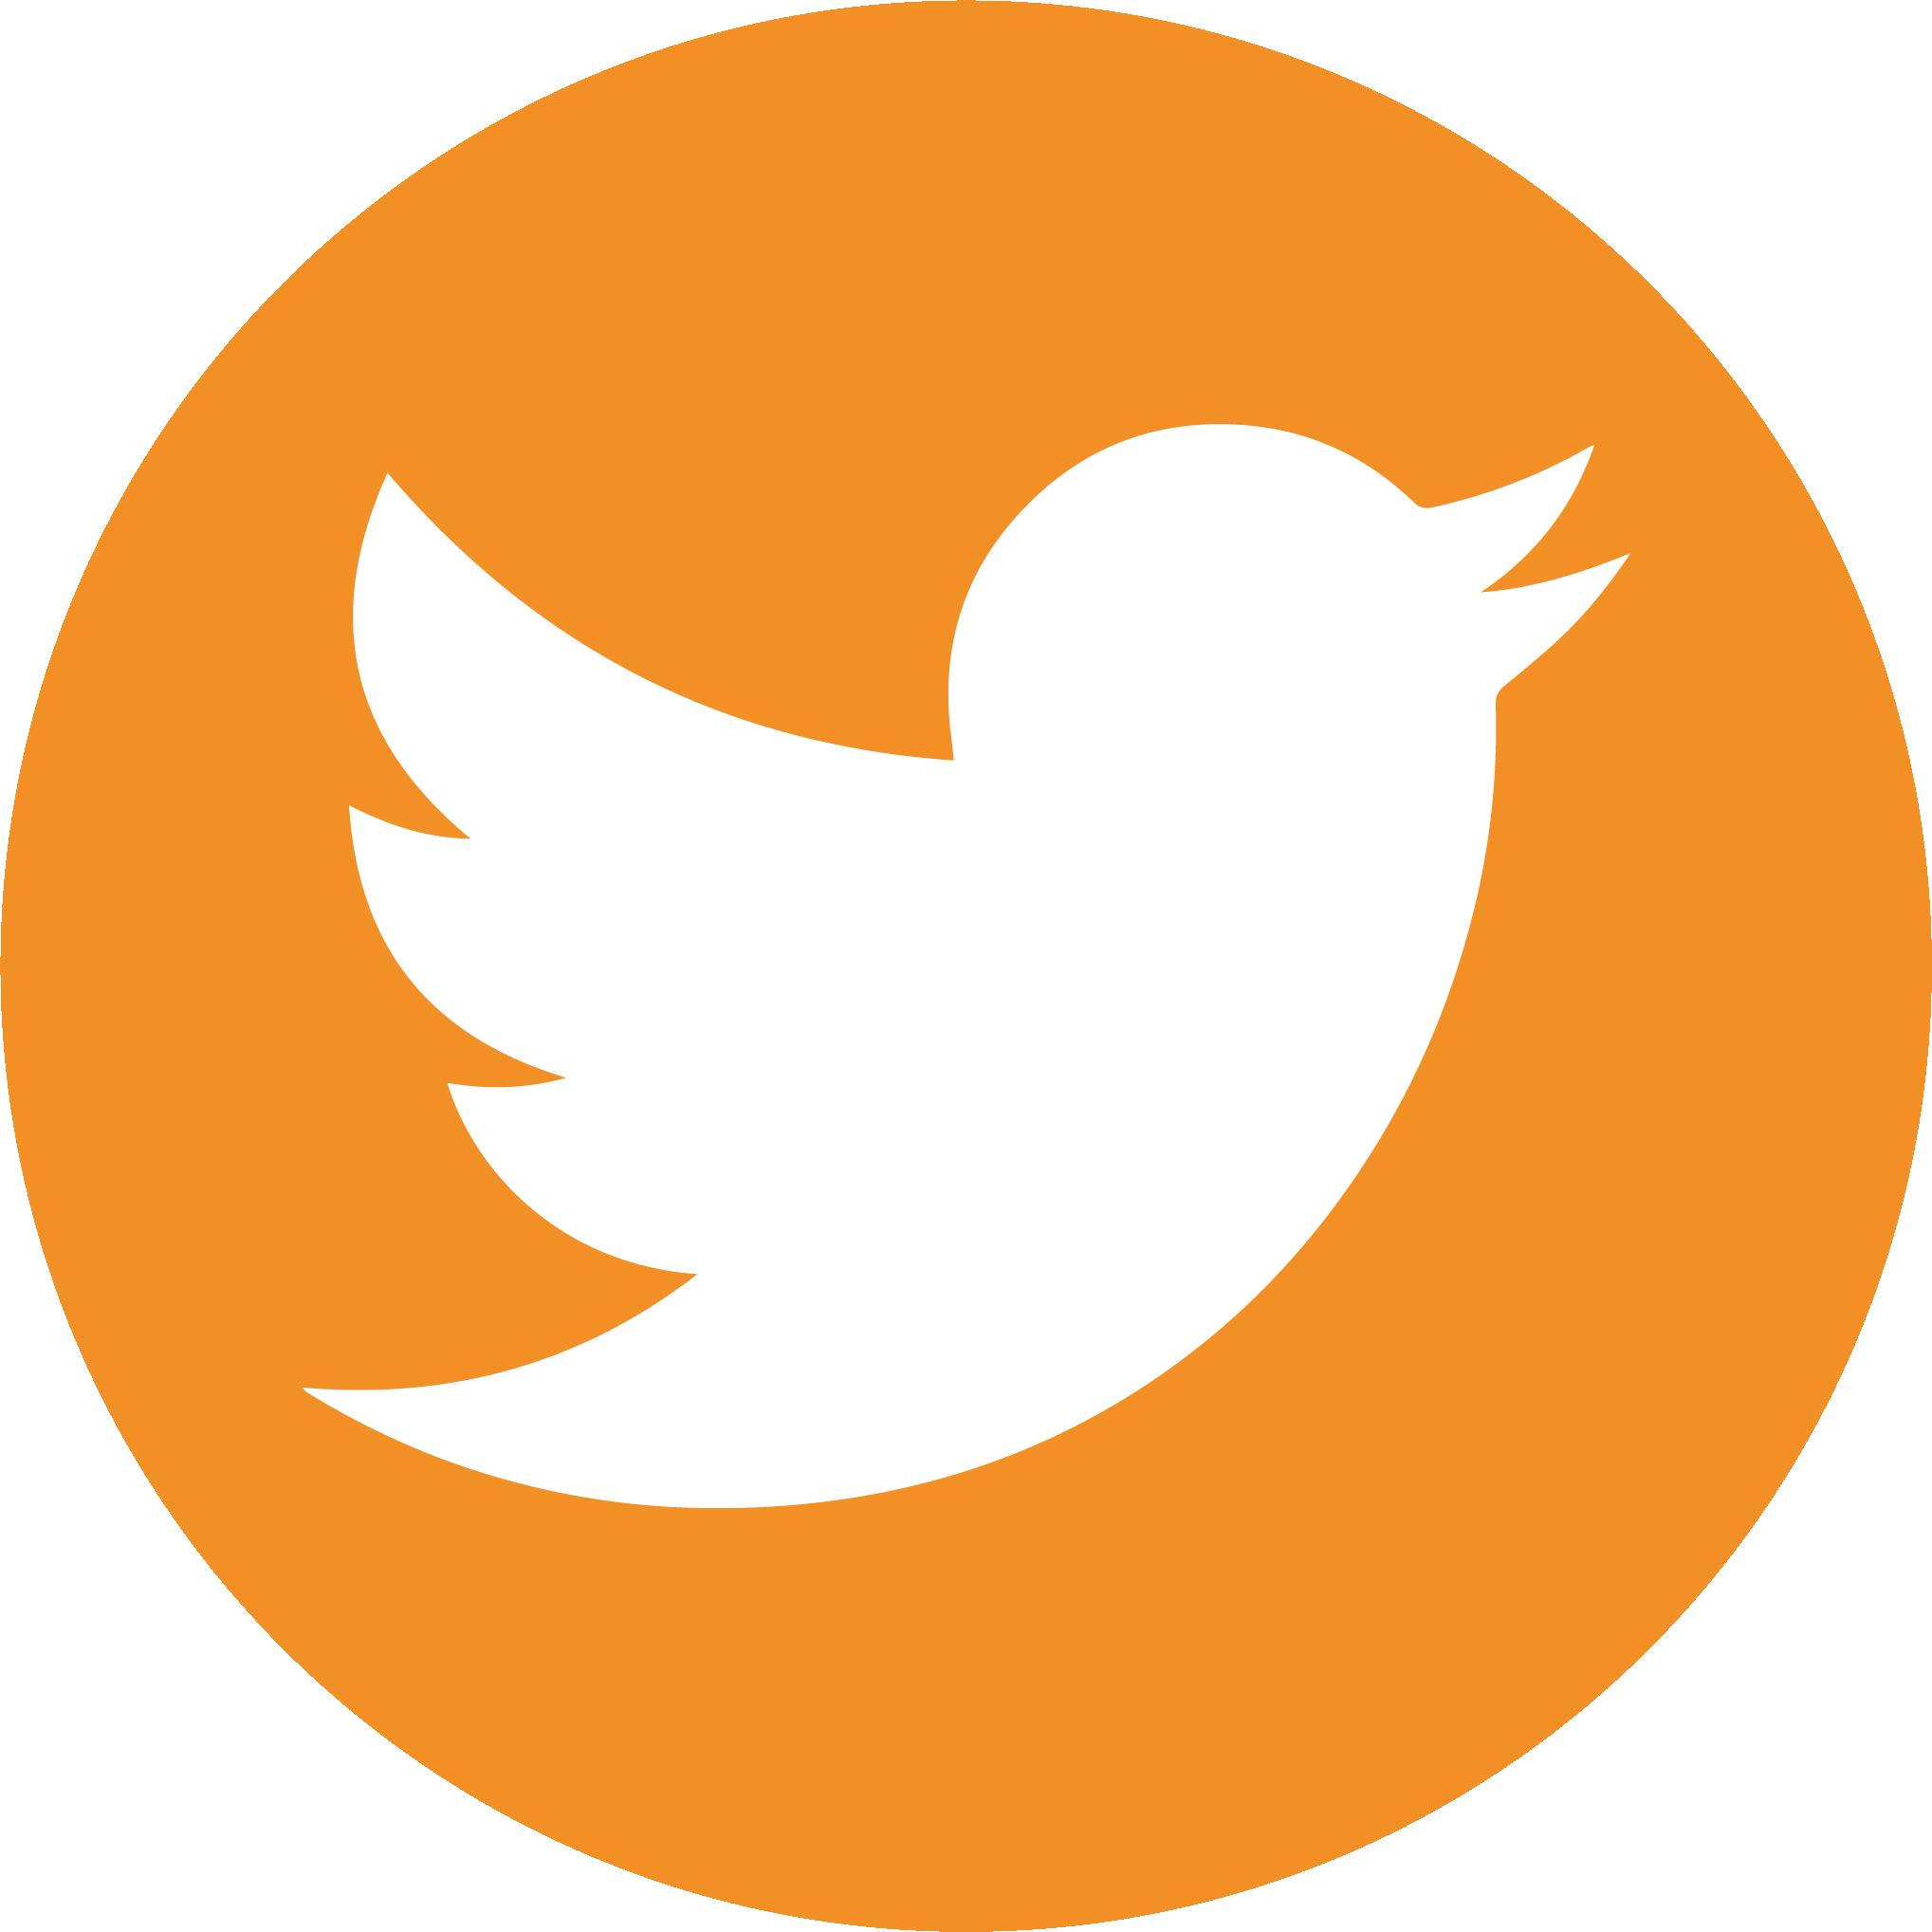 Twitter social media button